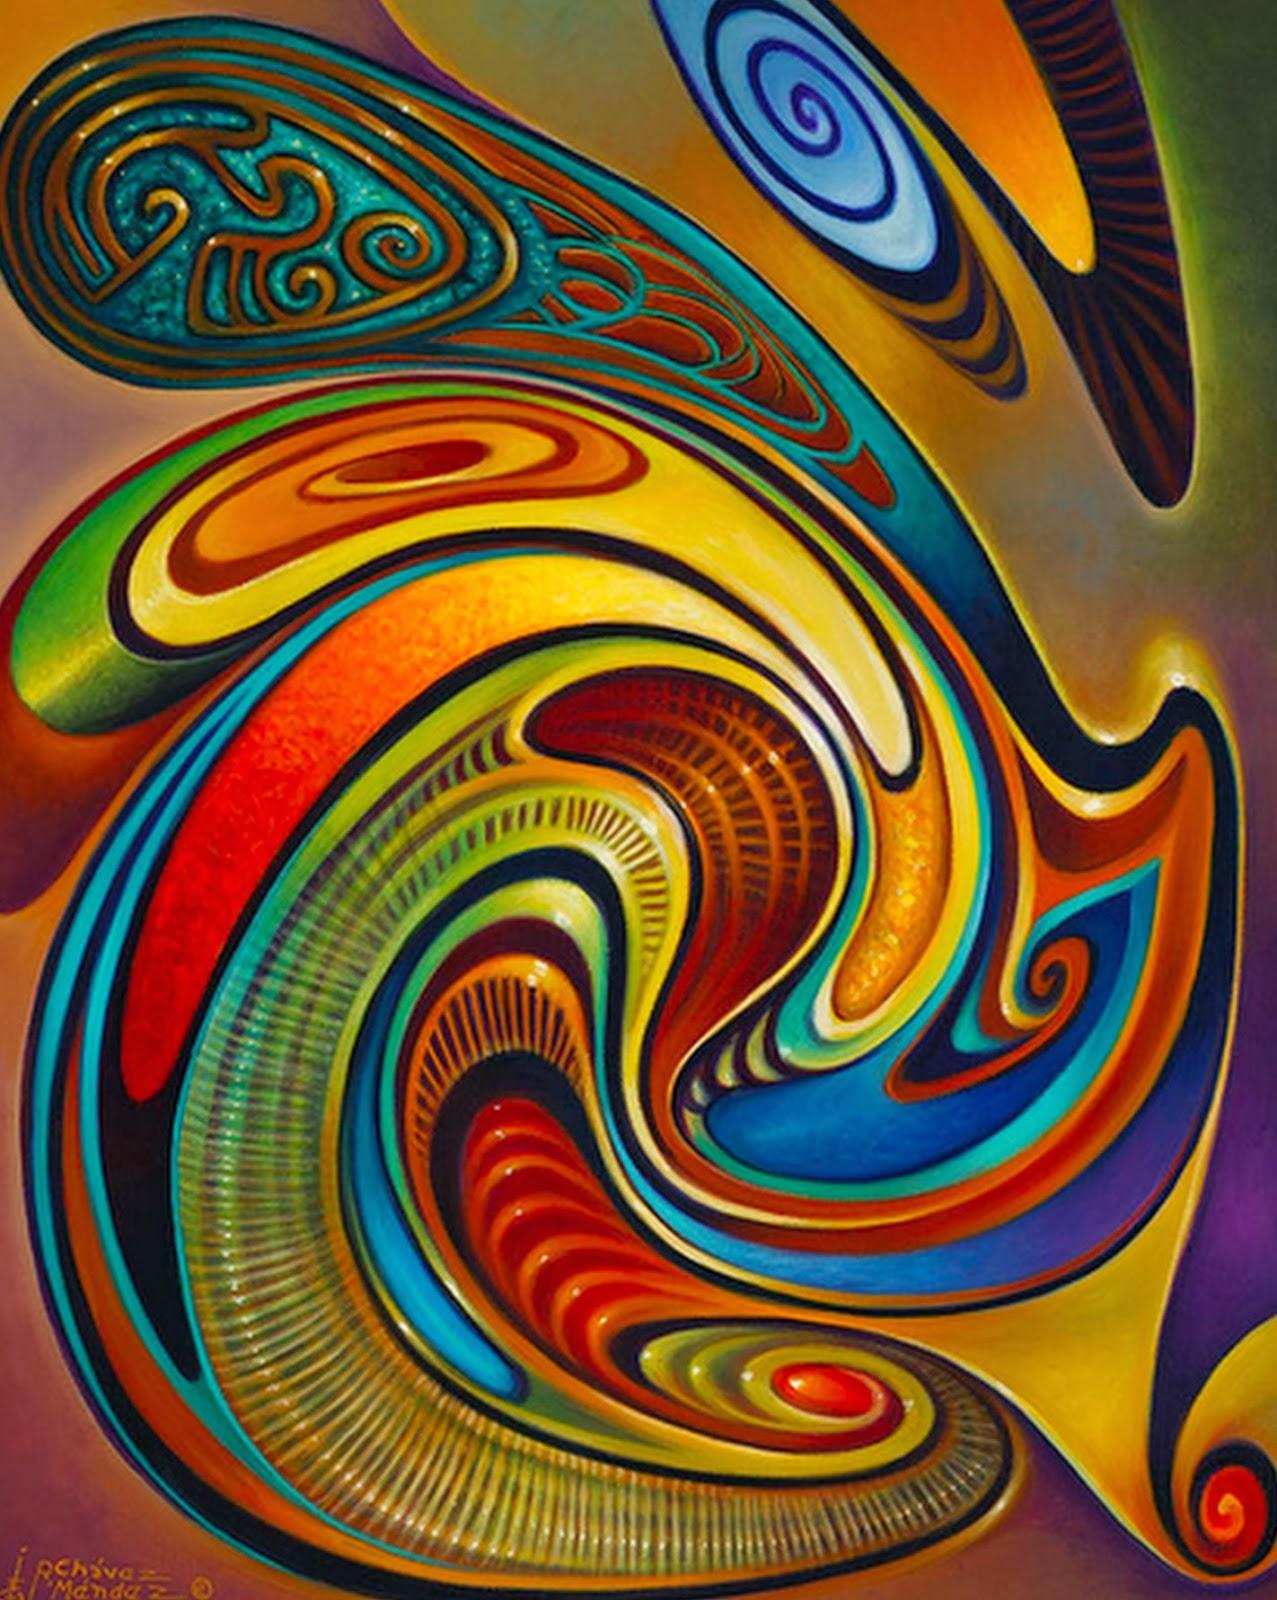 Pinturas cuadros lienzos cuadros abstractos modernos for Imagenes de cuadros abstractos faciles